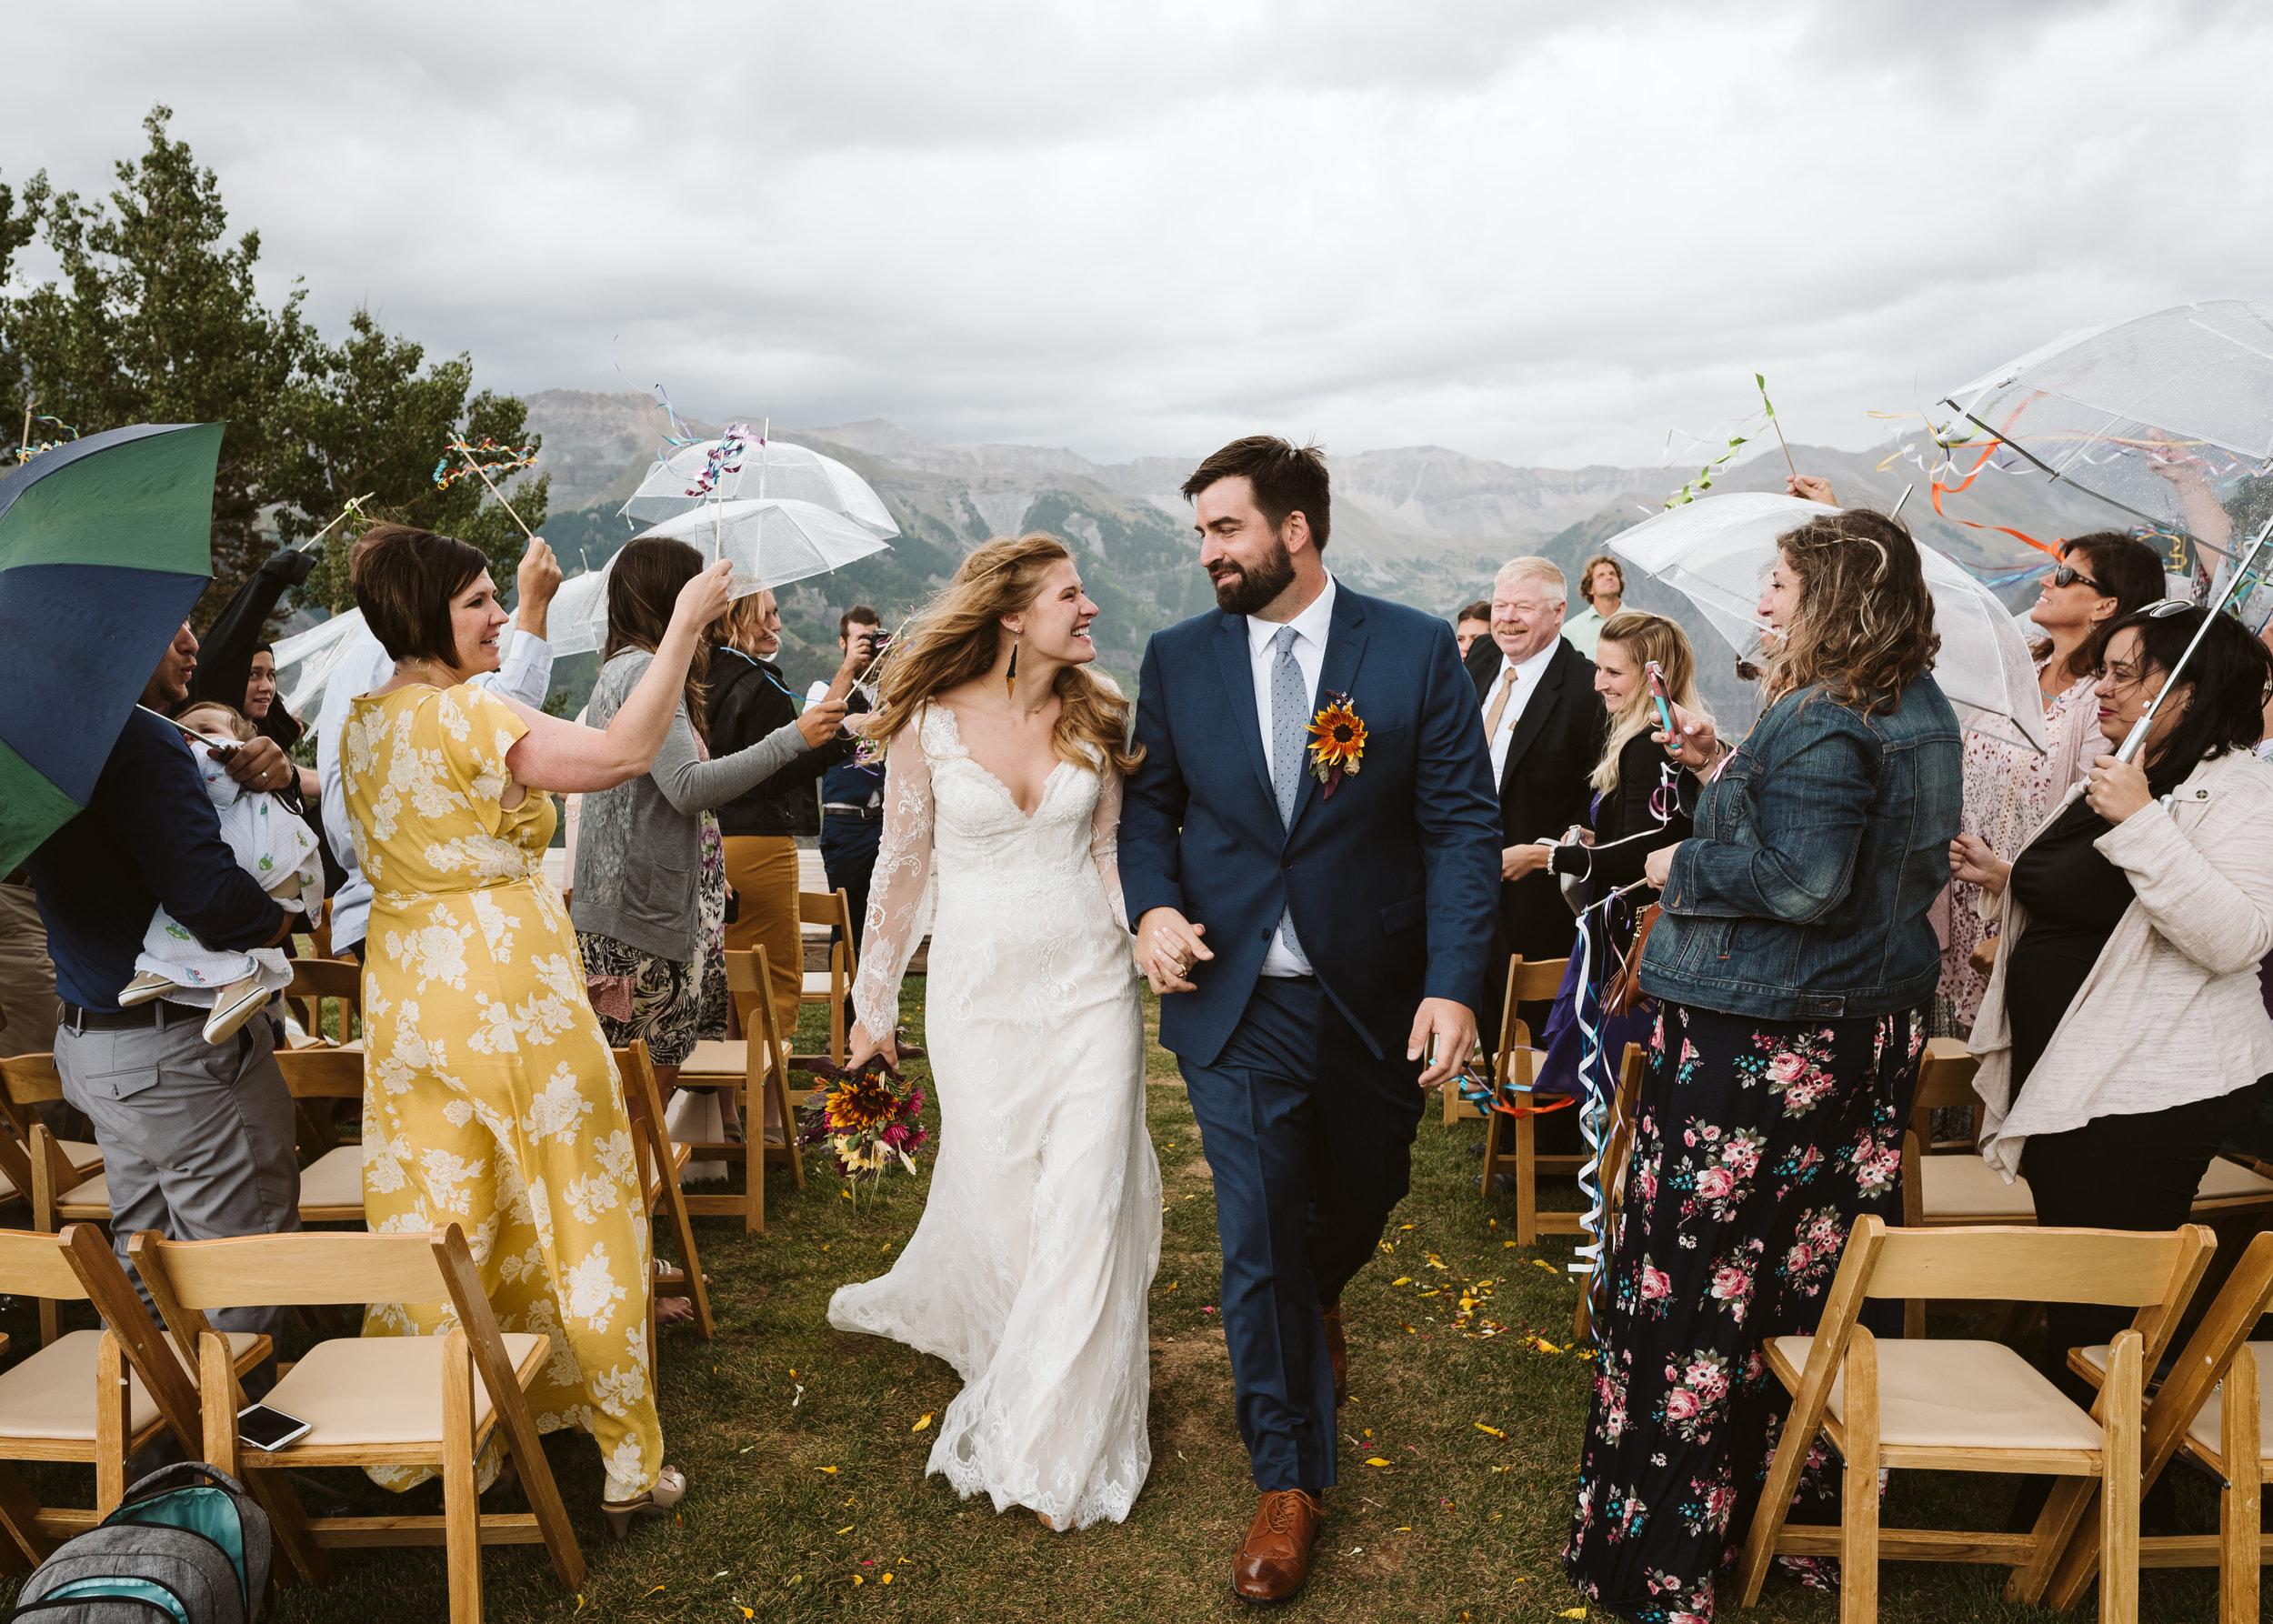 Whitney & Dan - Rainy Mountain Wedding